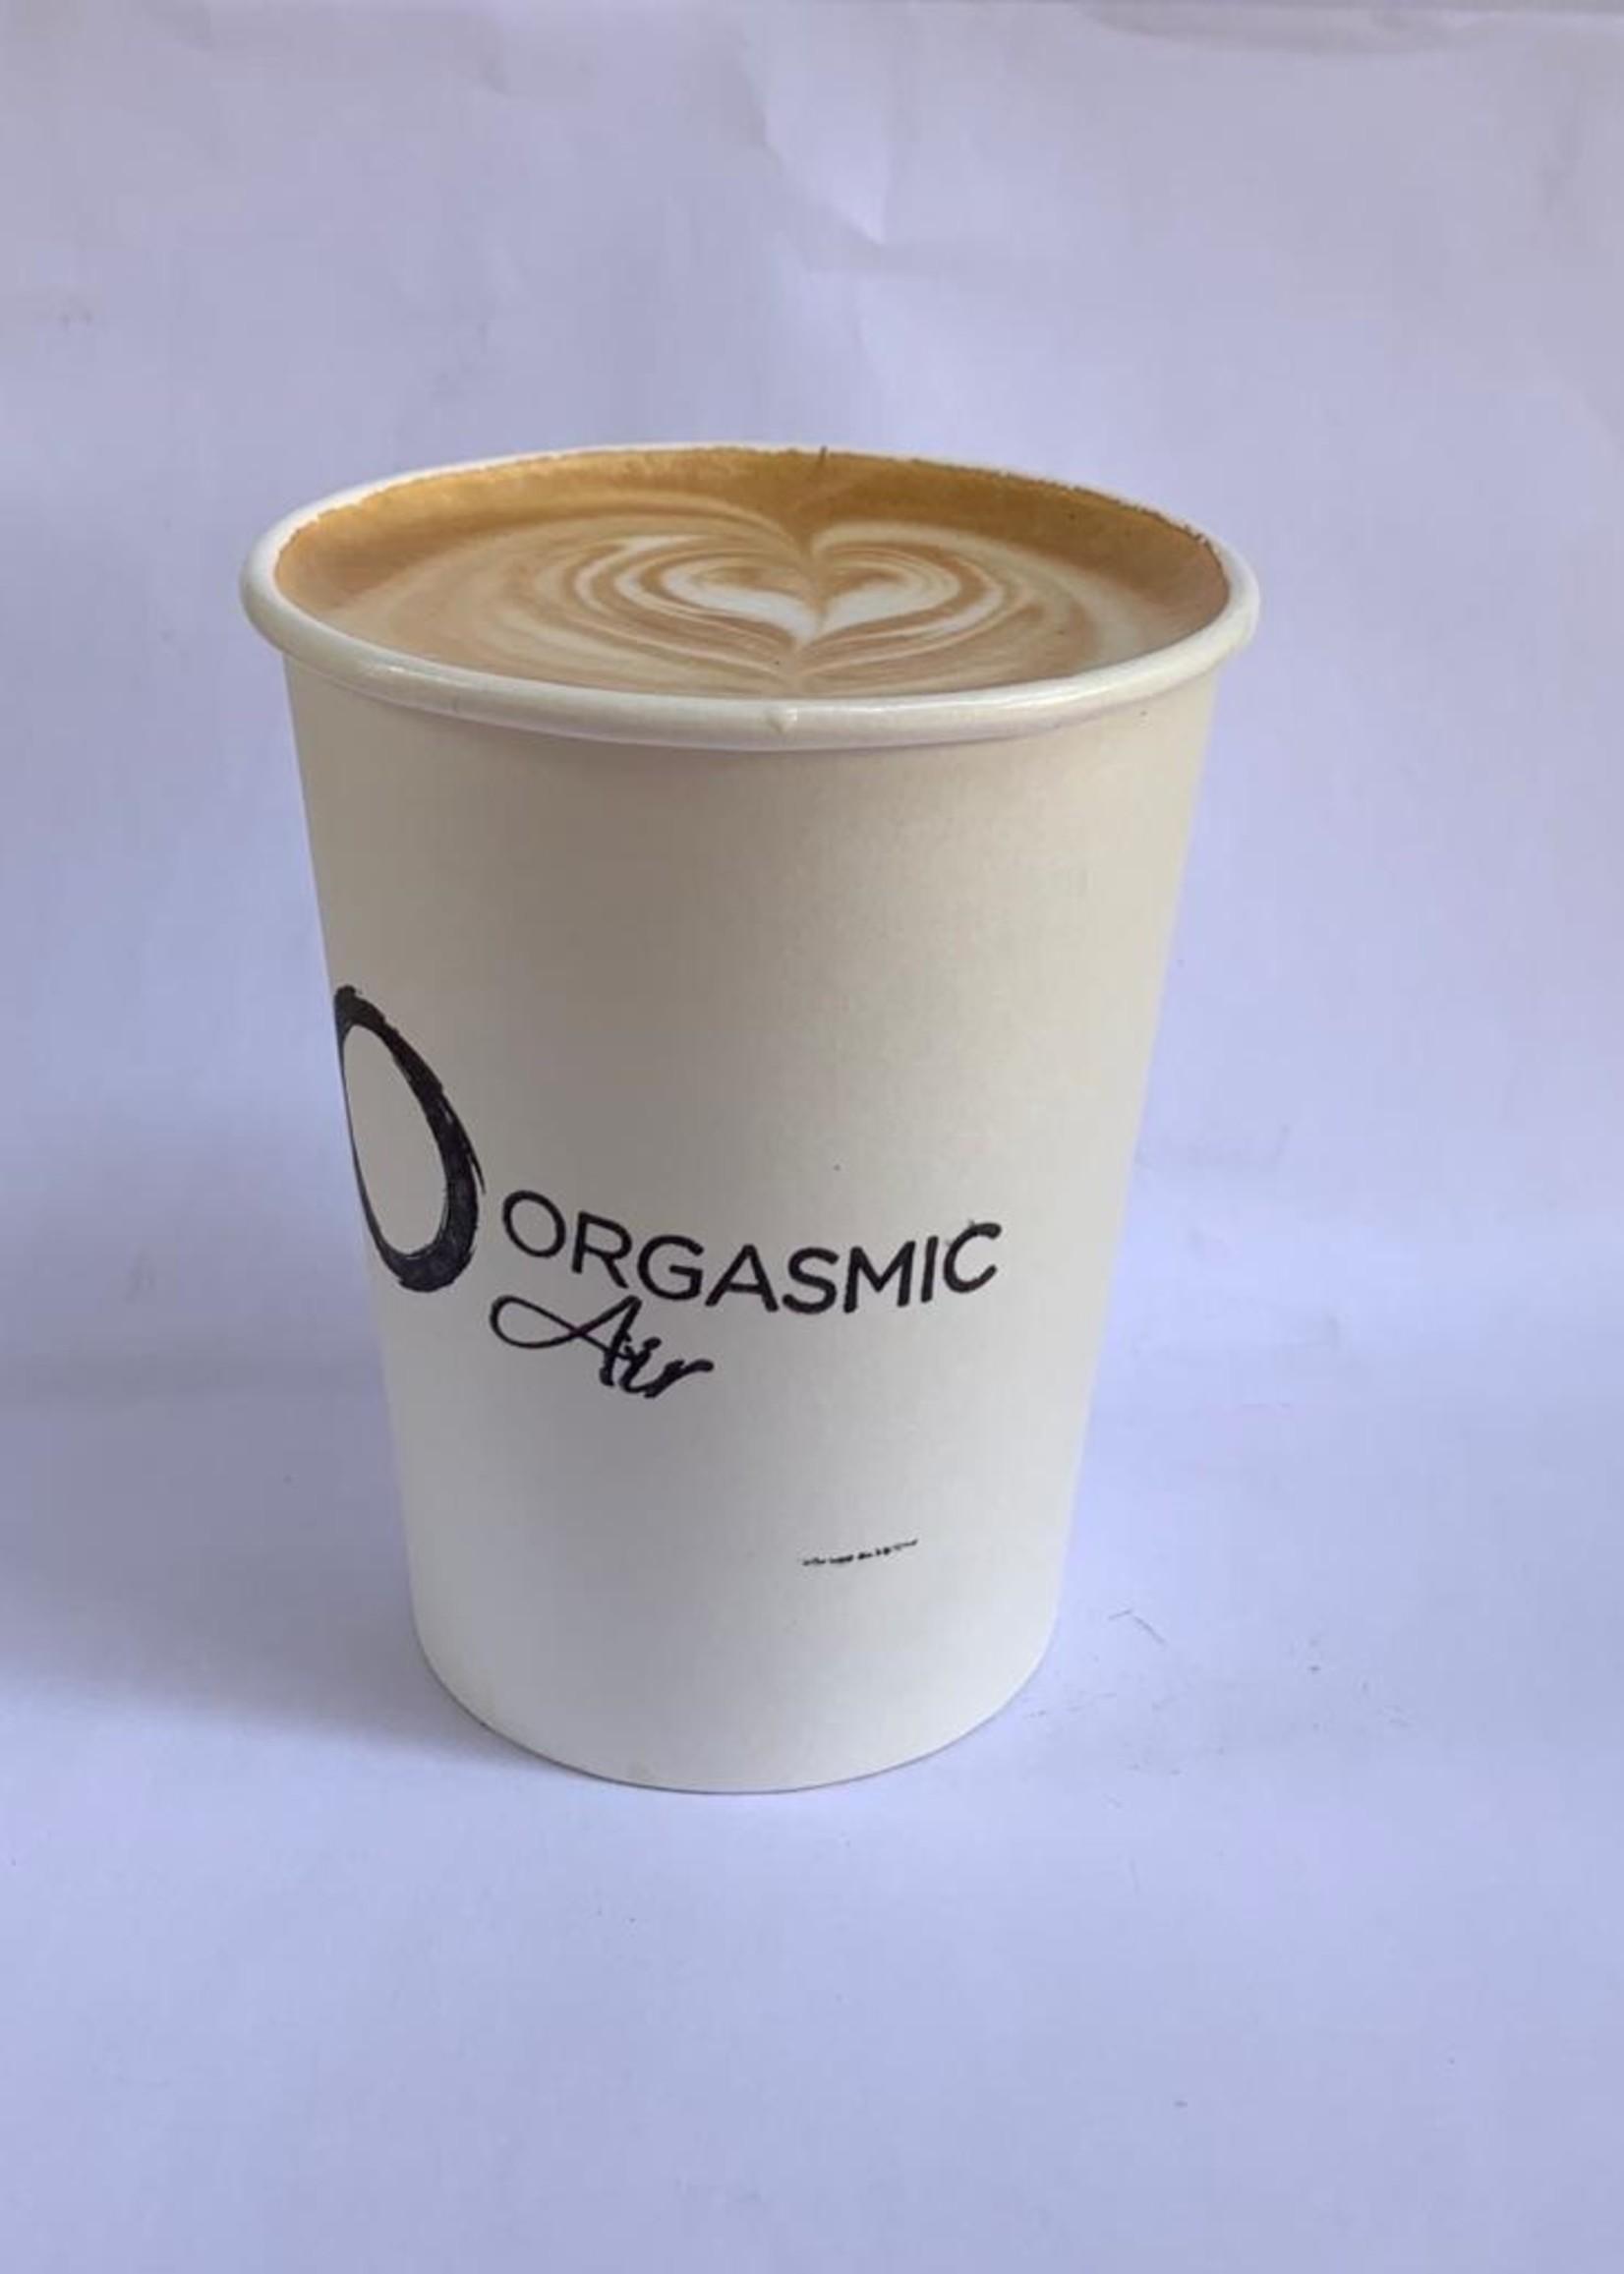 Organic & Air Large cappuccino